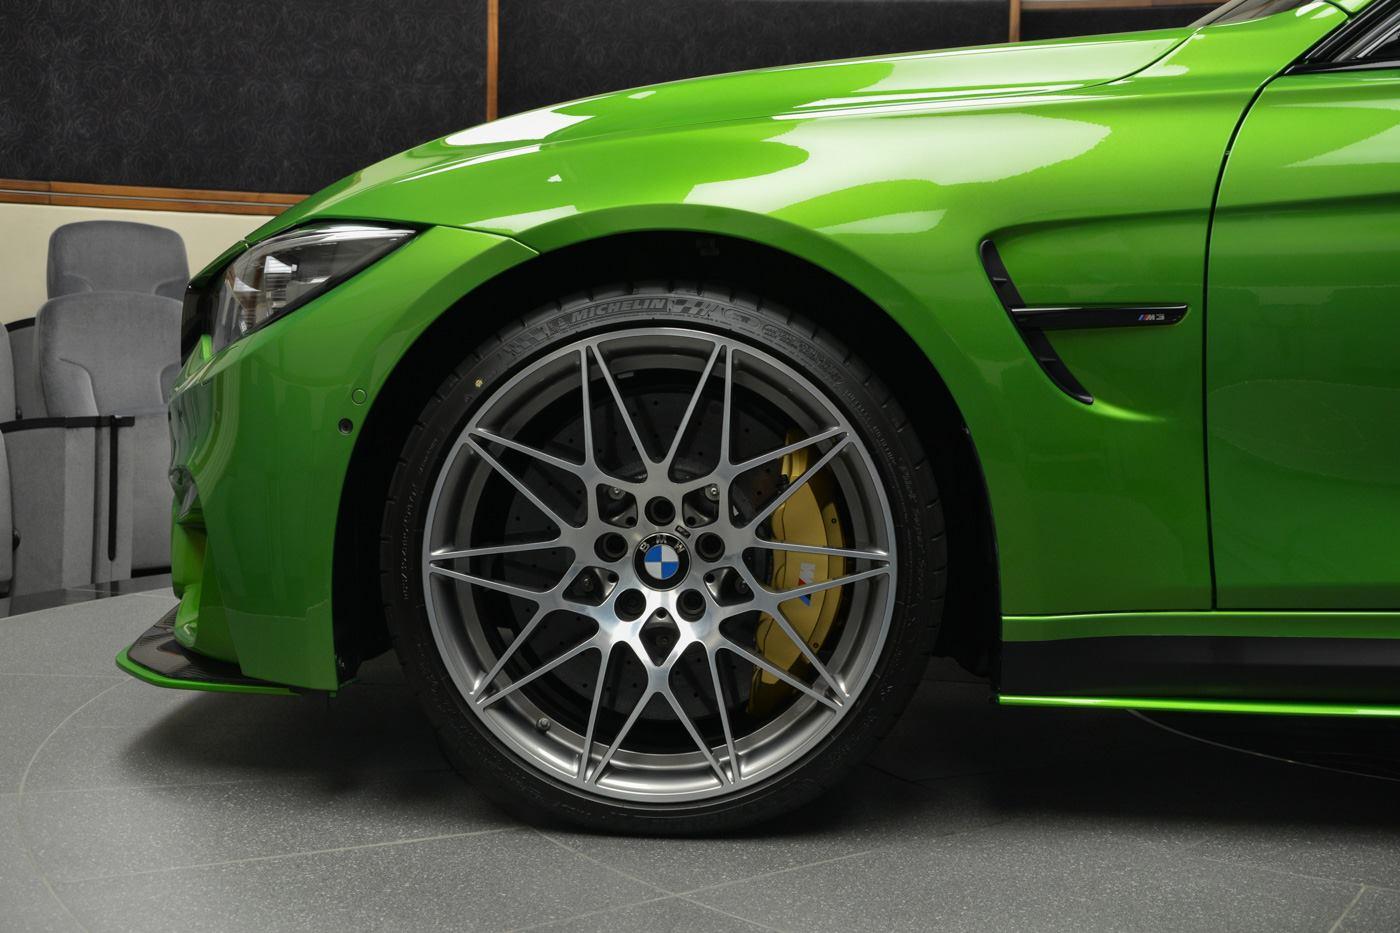 BMW_M3_Java_Green_12